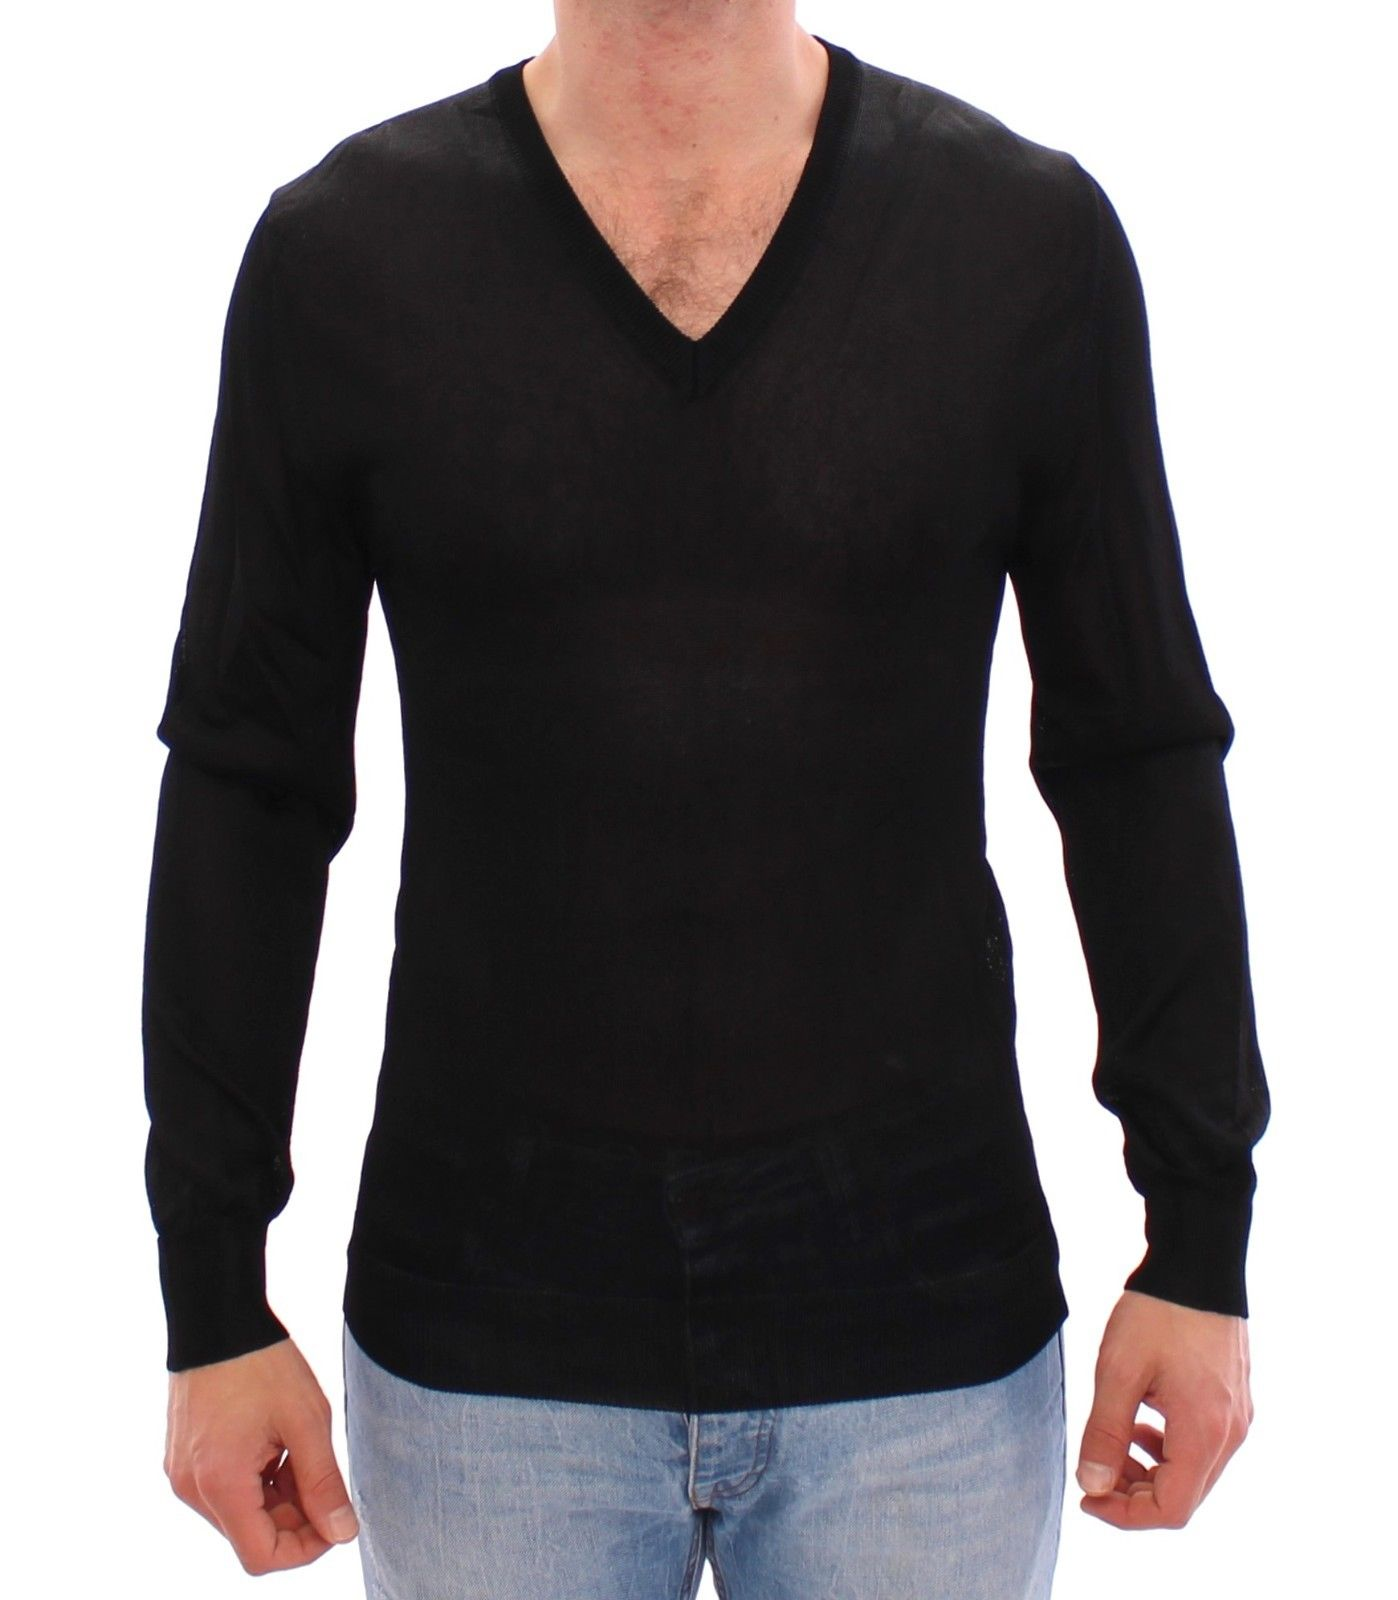 Dolce & Gabbana Men's V-neck Rayon Sweater Black MOM11304 - IT46 | S